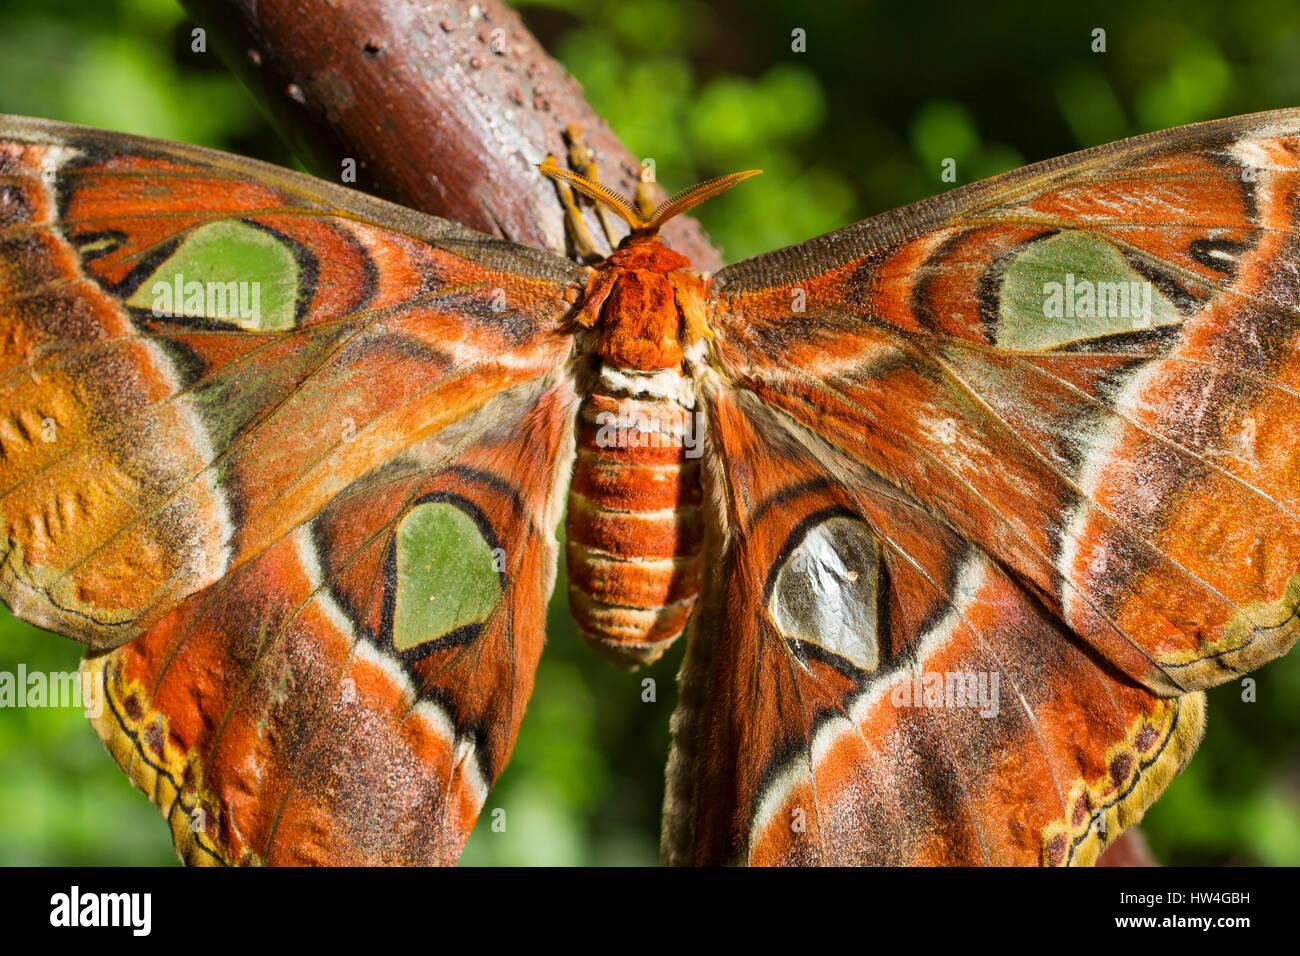 Attacus atlas. Benalmadena Butterfly Park, Costa del Sol, Malaga, Spain Europe - Stock Image